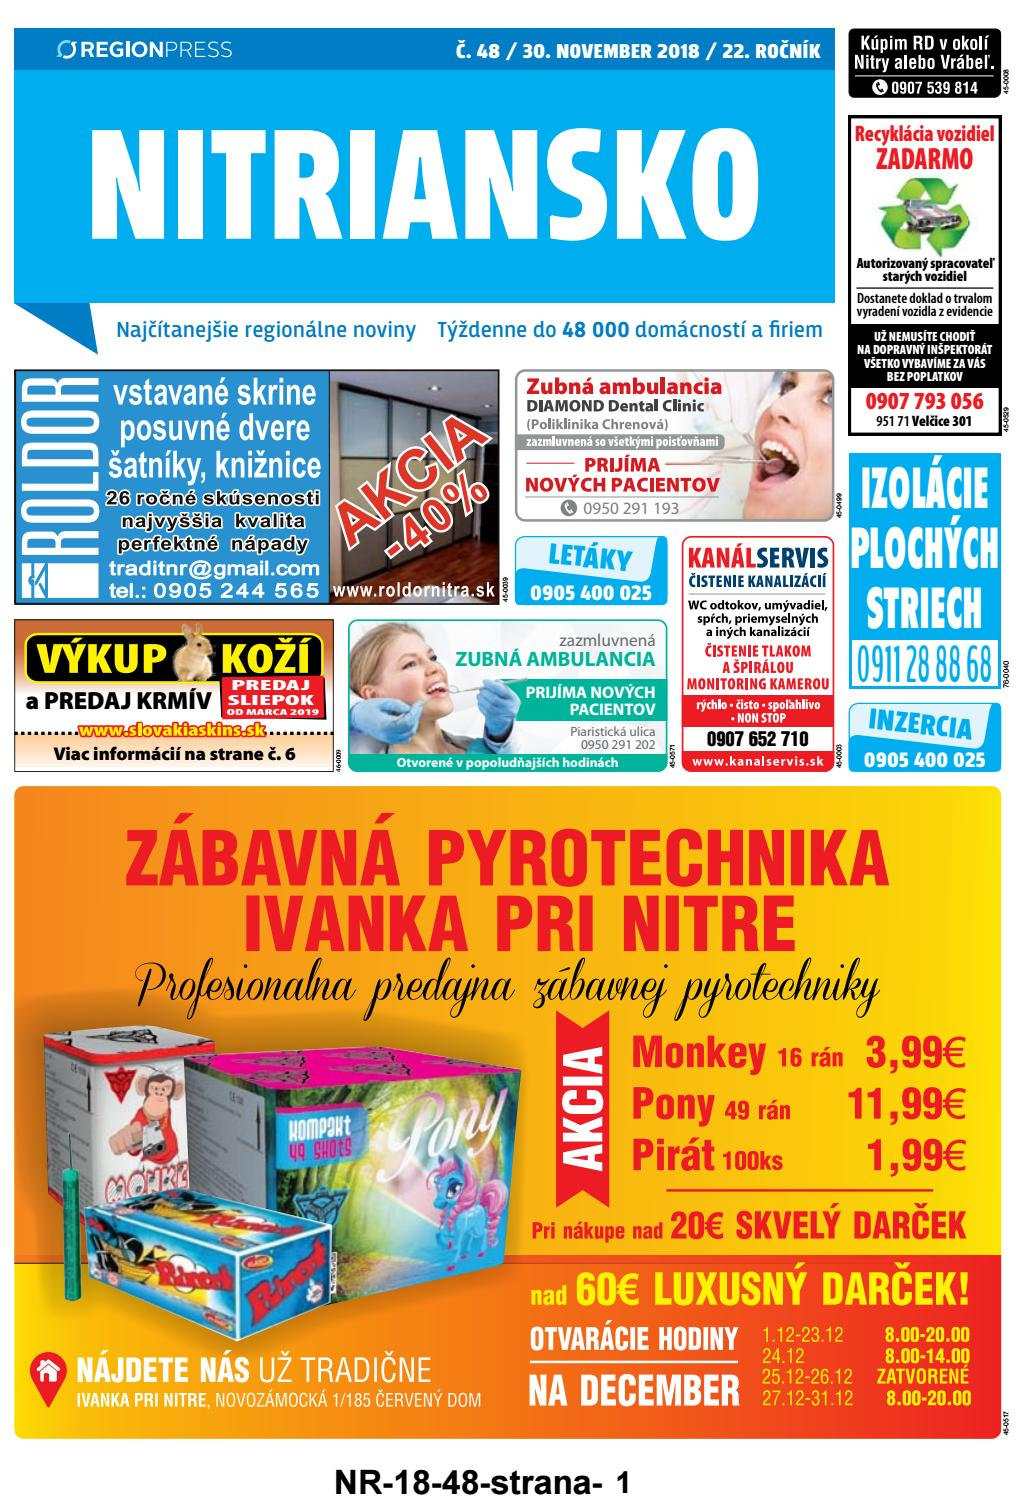 Natrelle.,, ))). Aveeno smart essentials hydratačný krém spf 30.